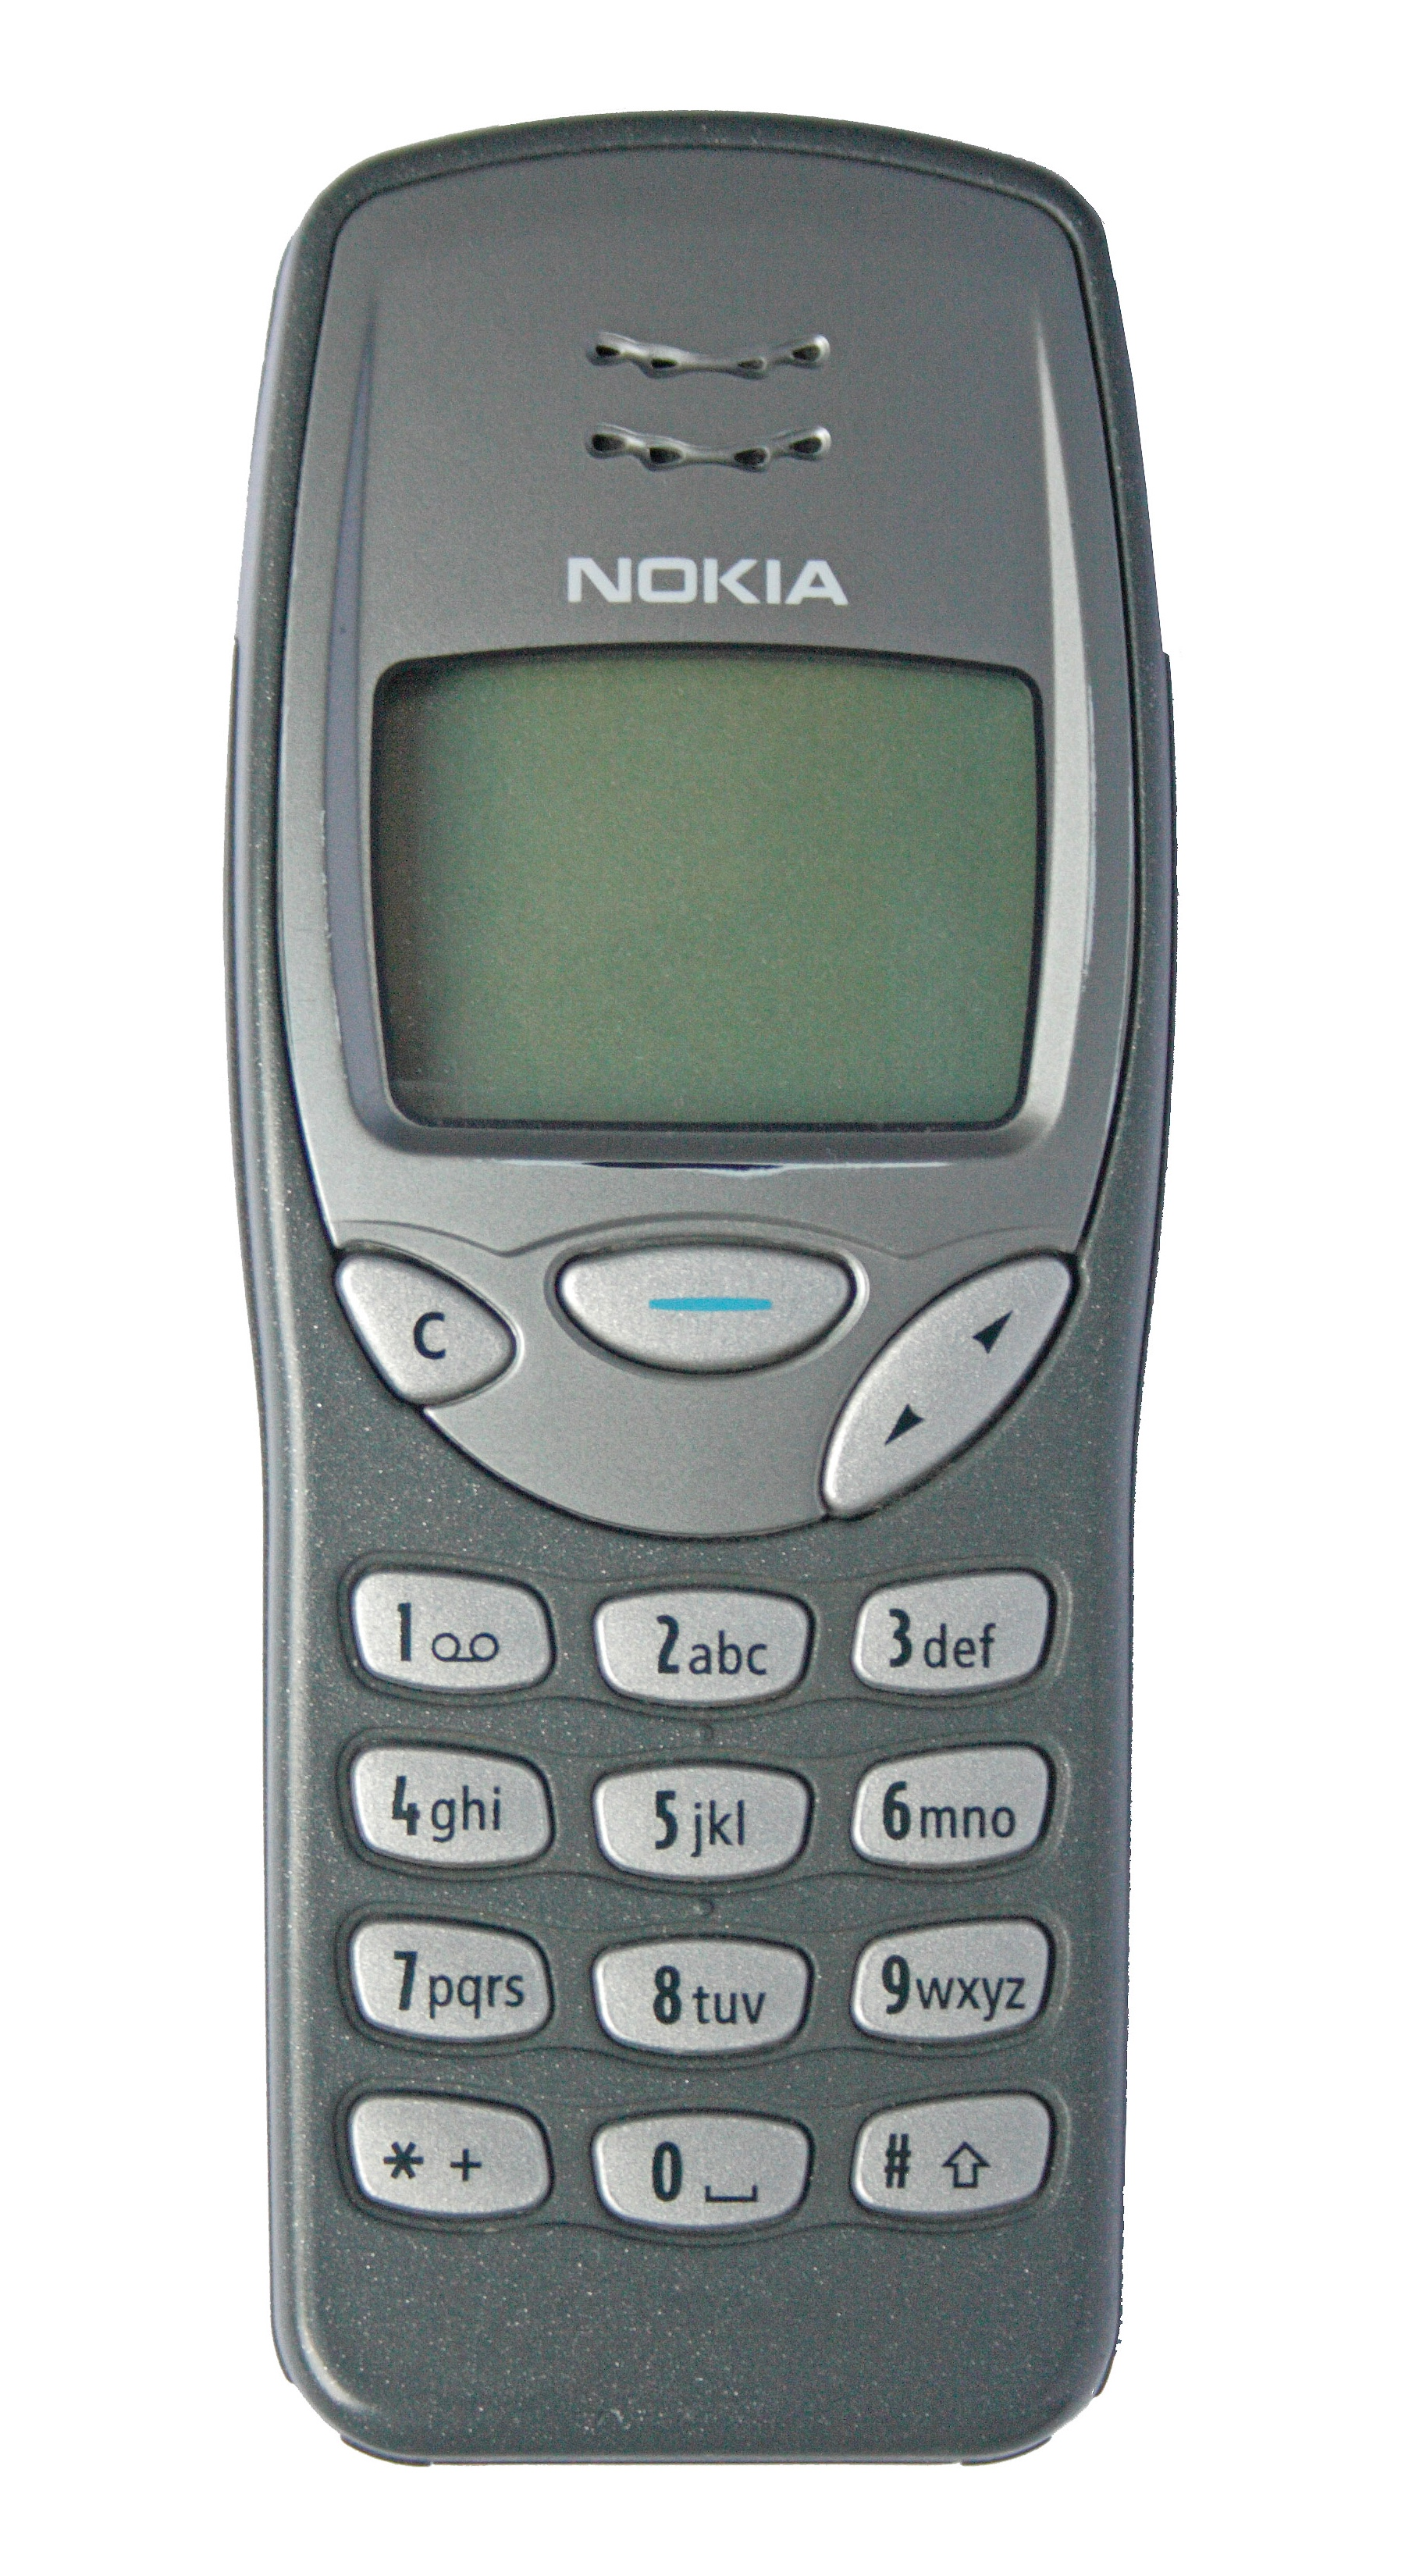 The trusty ol' Nokia 3210